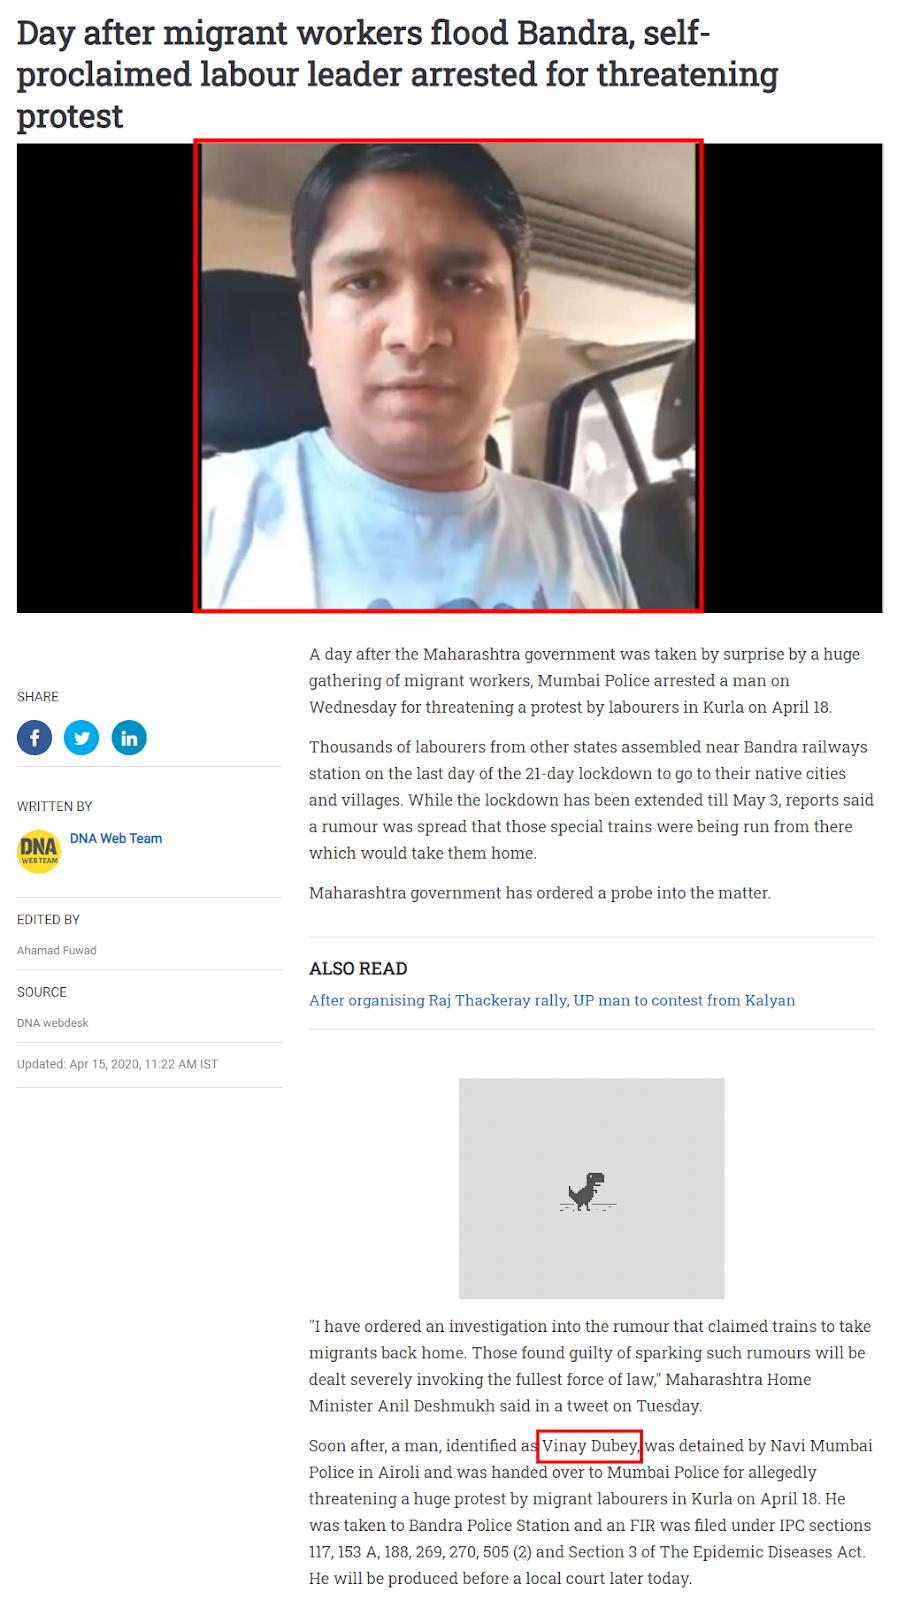 C:\Users\Lenovo\Desktop\FC\Vinay Dubey Chandrashekhar Azad5.jpg